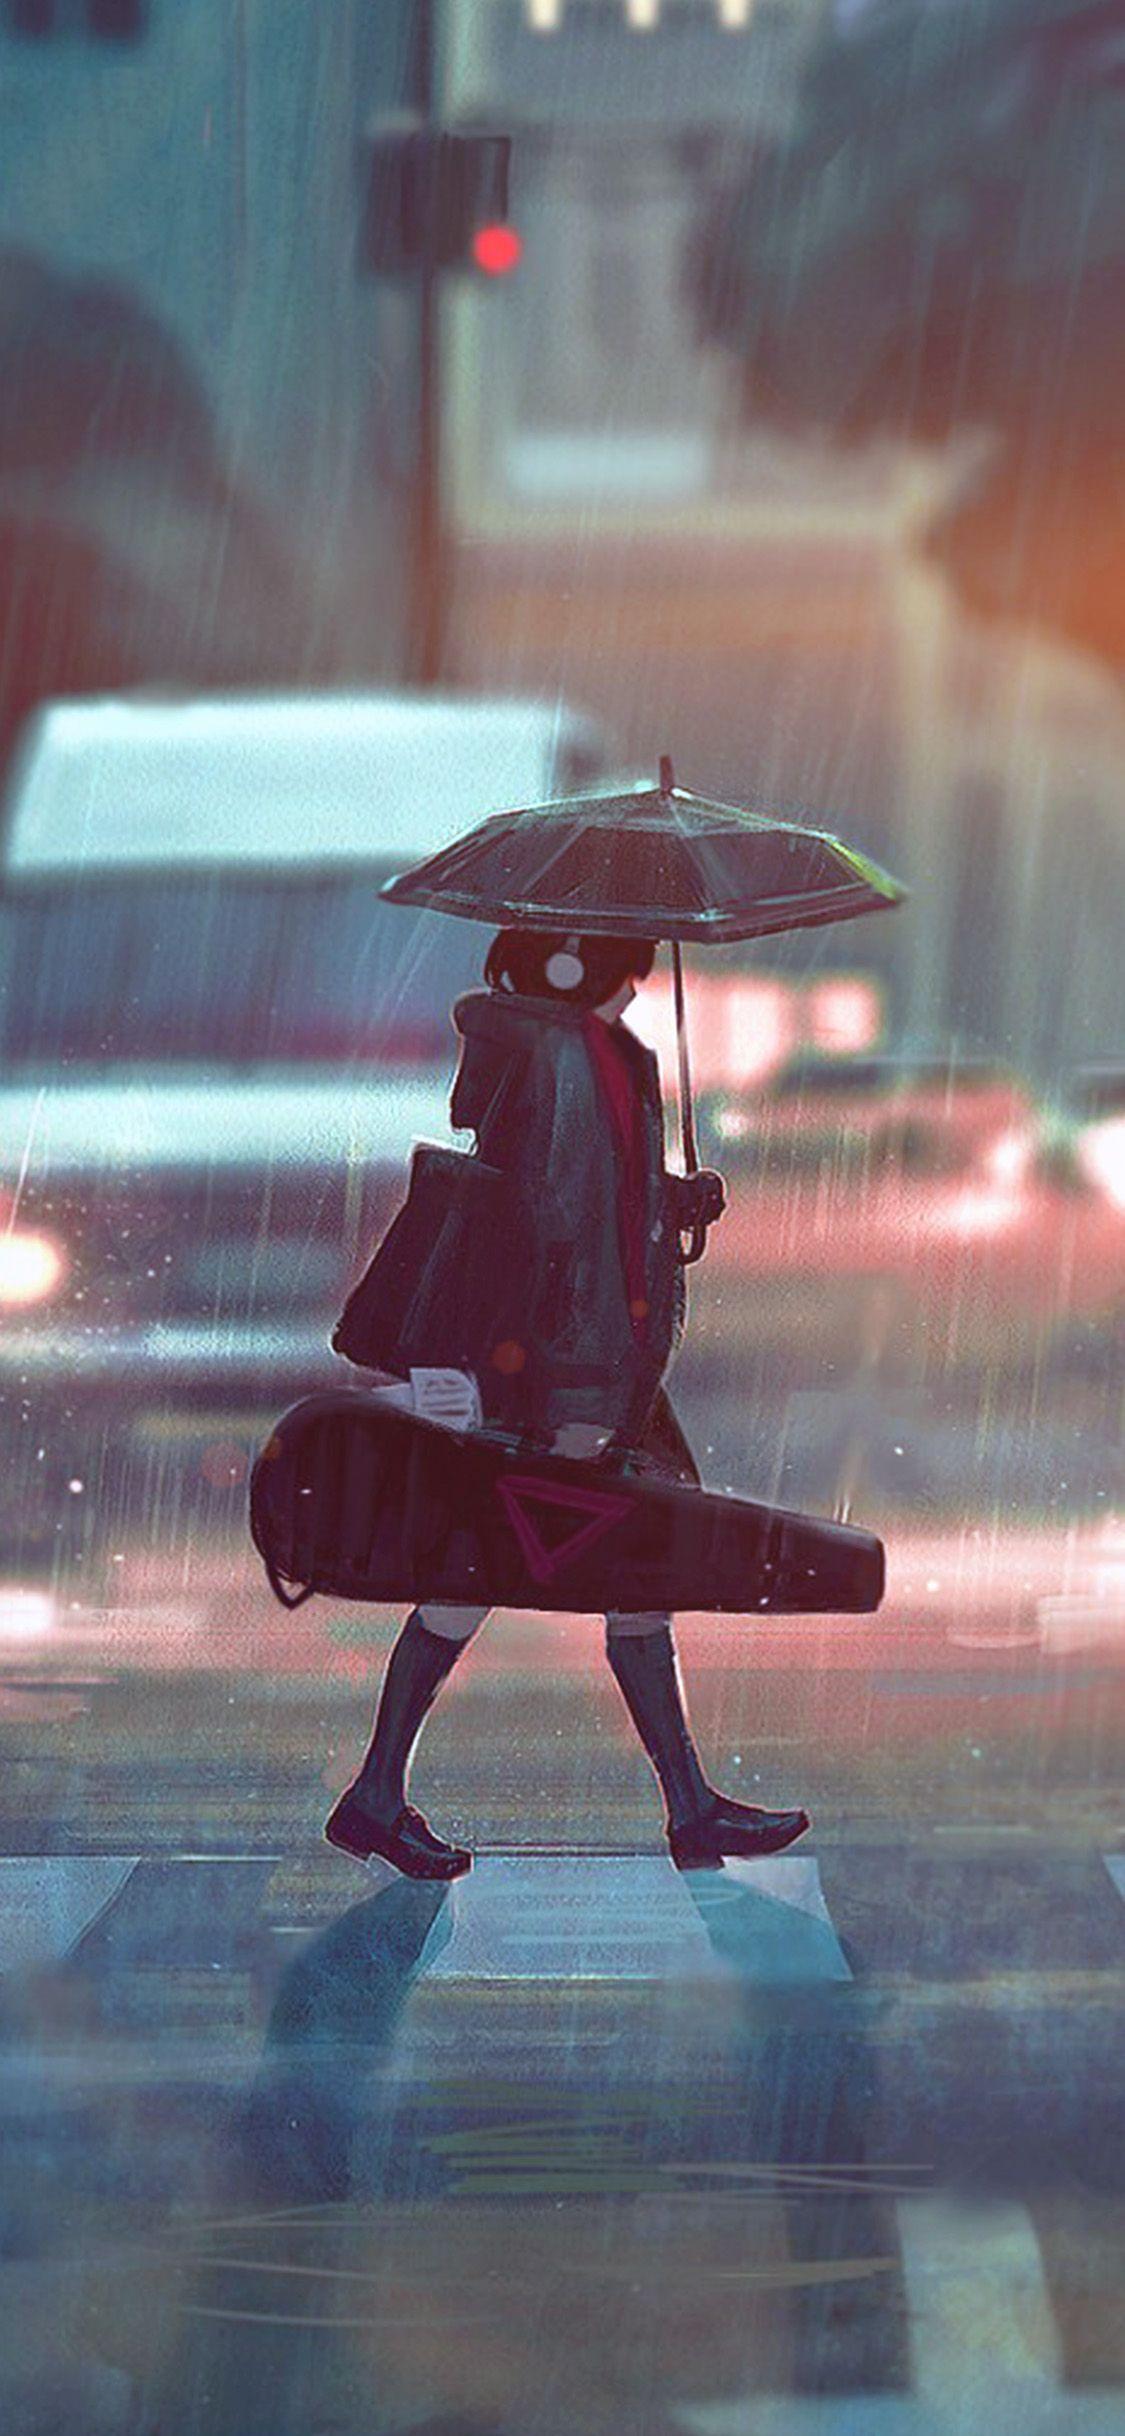 Bc90 Rainy Day Anime Paint Girl Art Illustration Flare Via Http Iphonexpapers Com Anime Wallpaper Phone Anime Backgrounds Wallpapers Anime Wallpaper Iphone